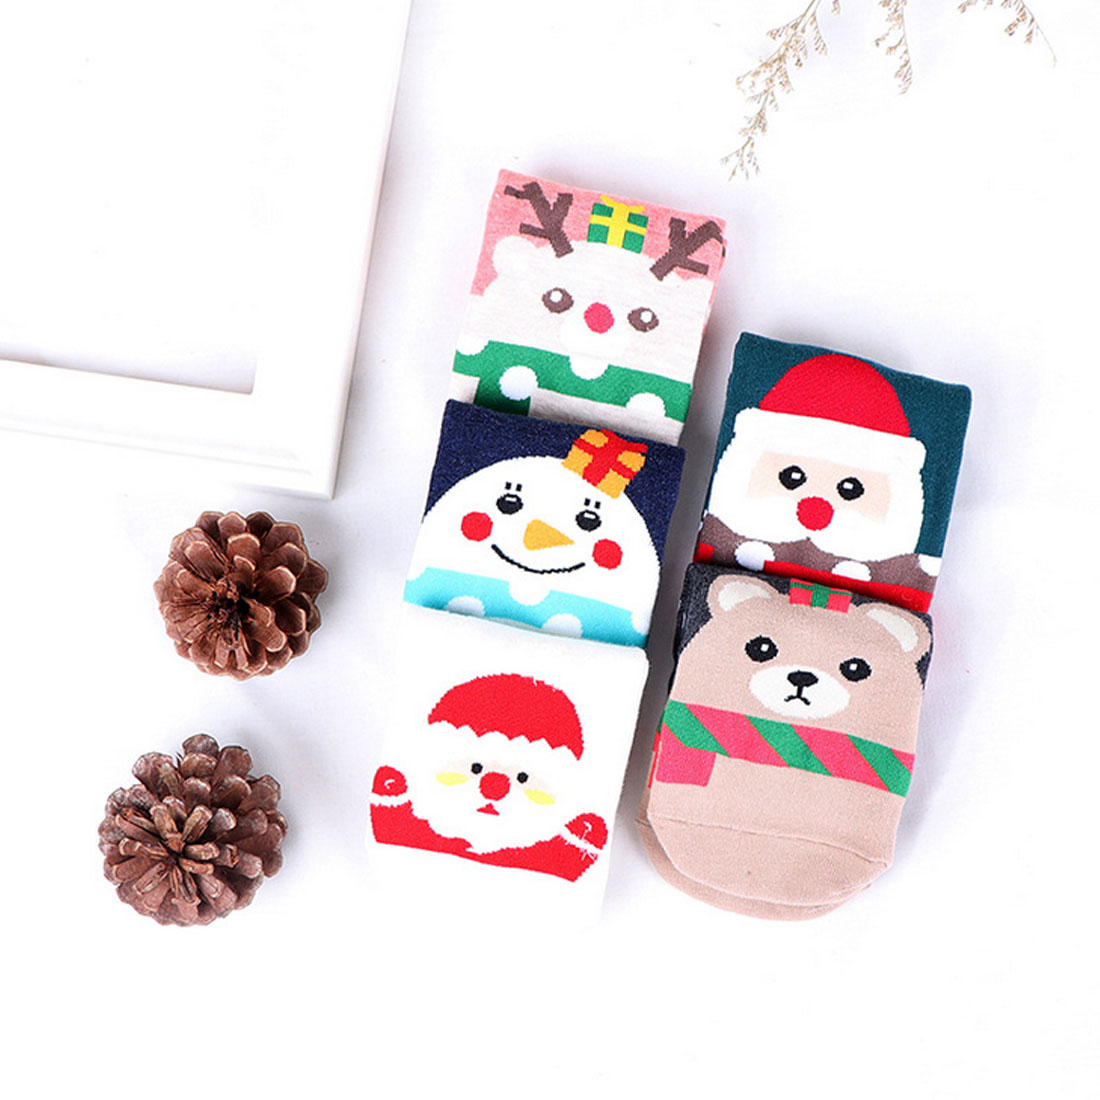 Fashion Cute boat socks summer autumn and winter new low-cut socks Santa socks women breathable sweat-absorbent cotton socks